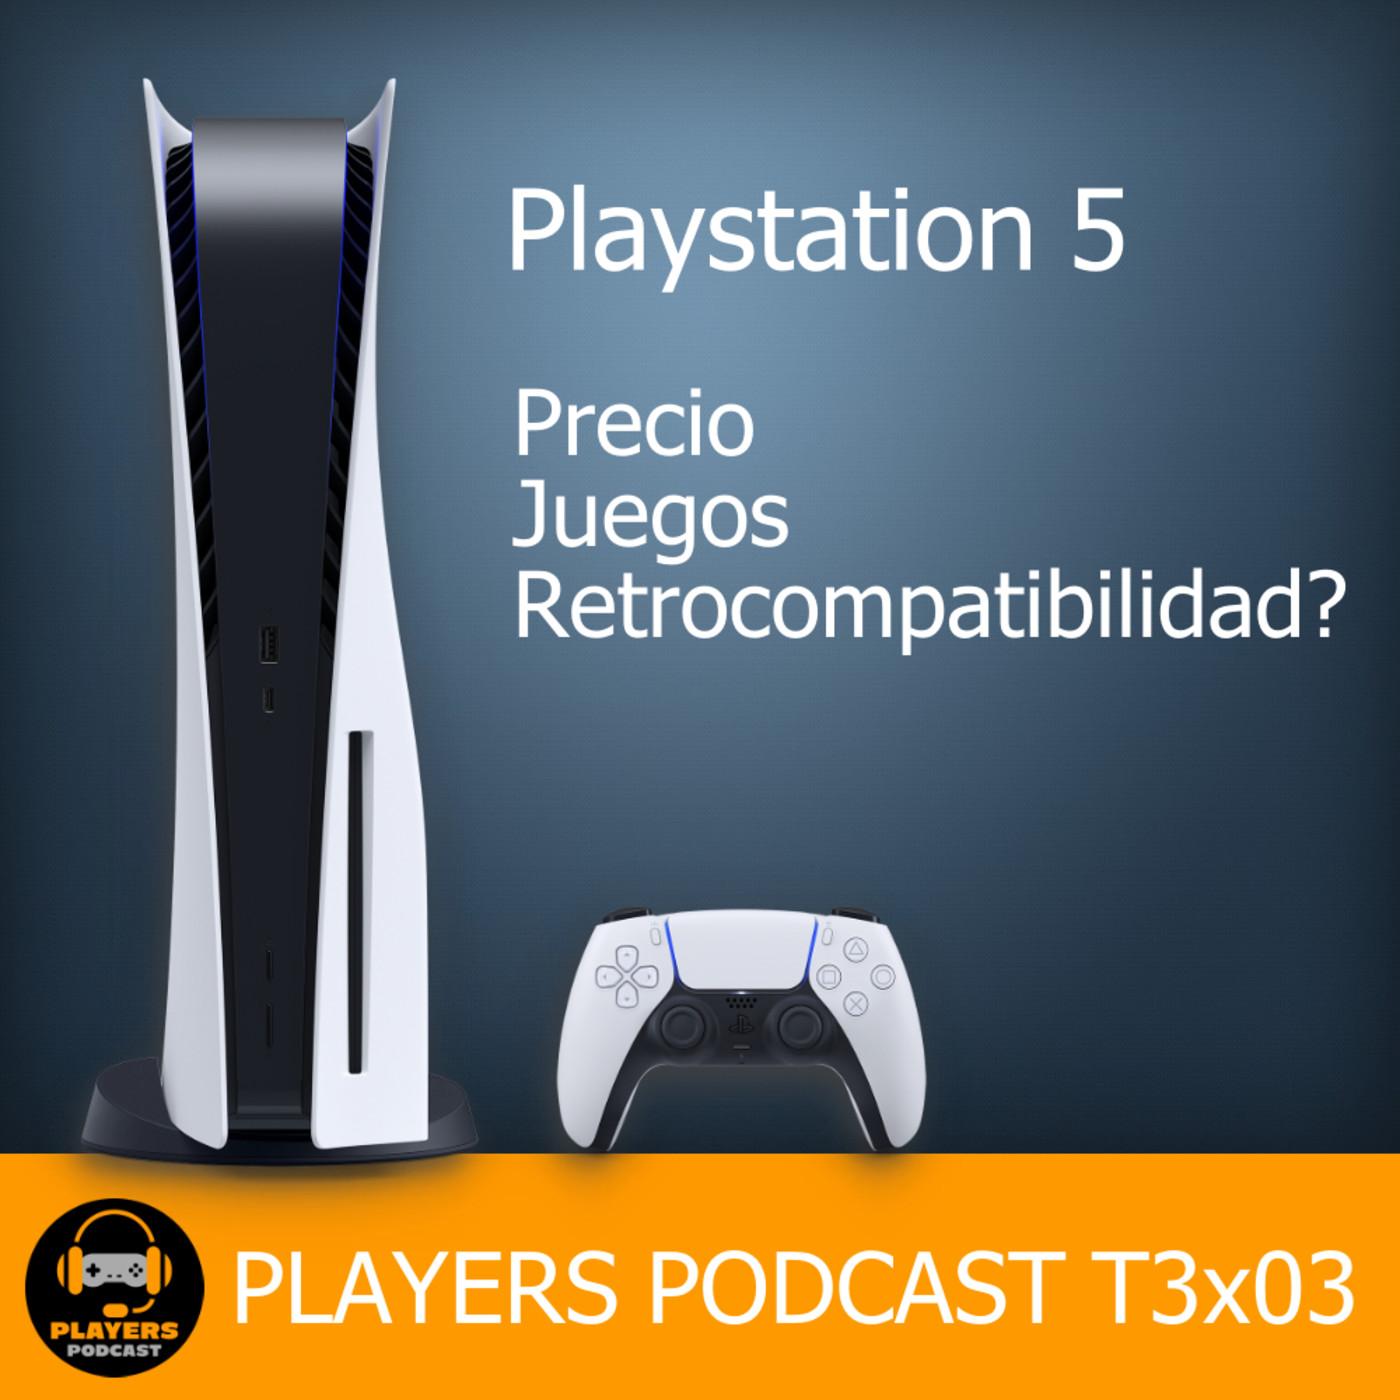 Players Podcast: PS5 ¡Ya agotada!, Insert Coin: Nintendo DS Historia y juegos